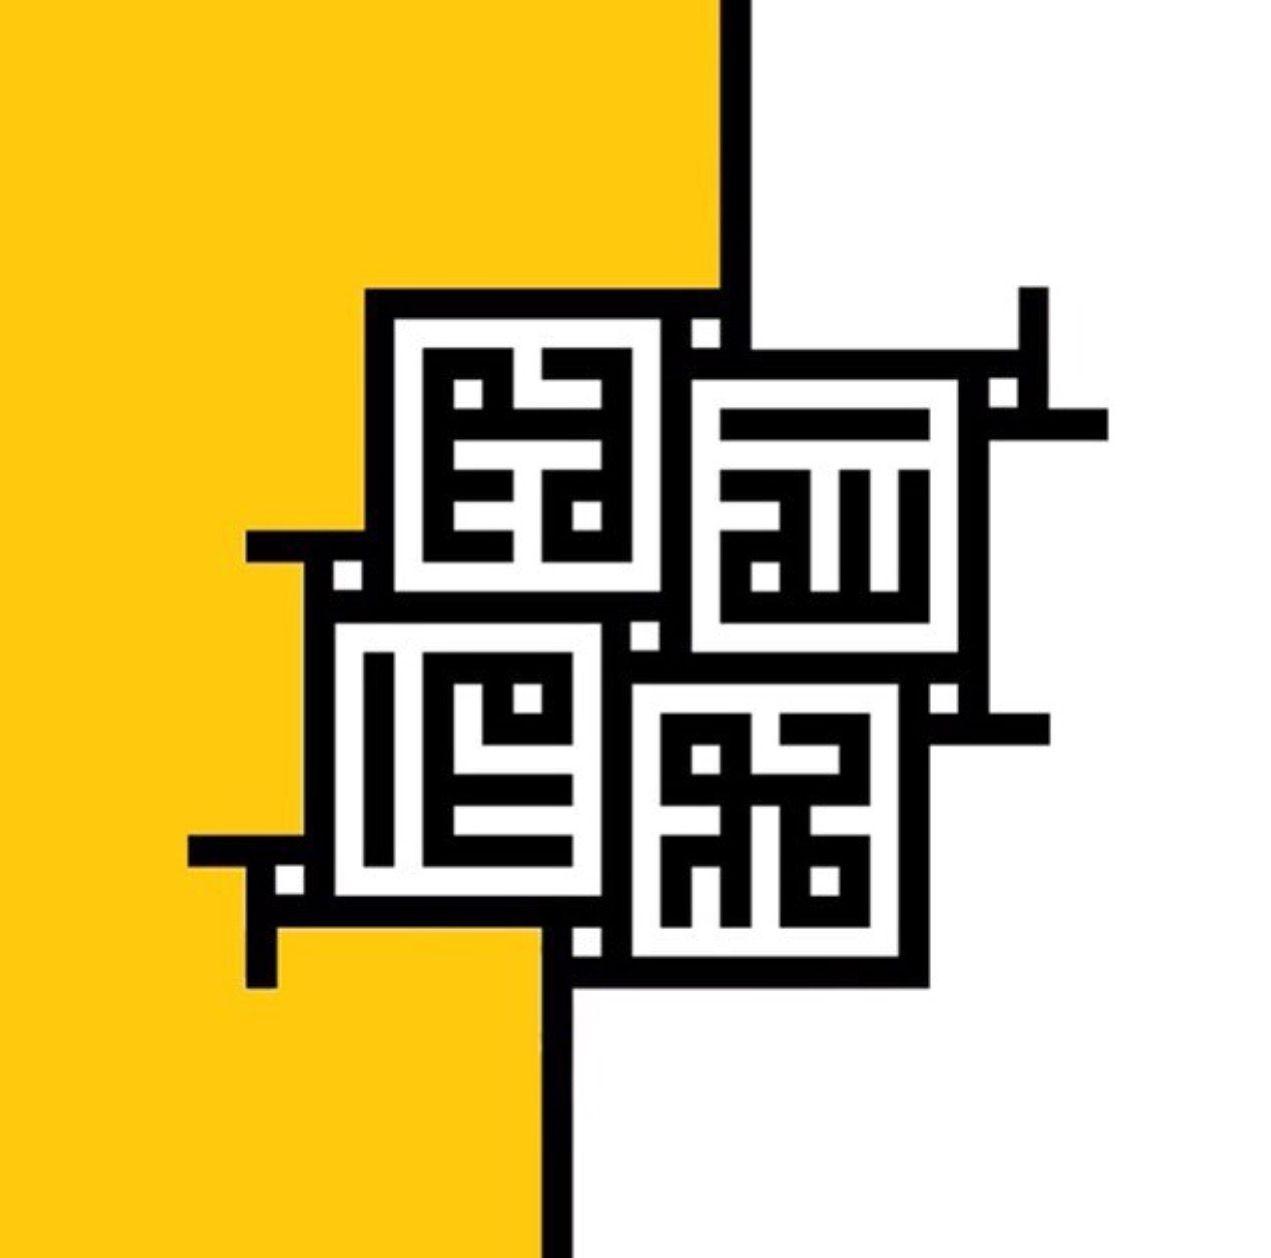 Islamic Calligraphy Gambar Ide Kaligrafi